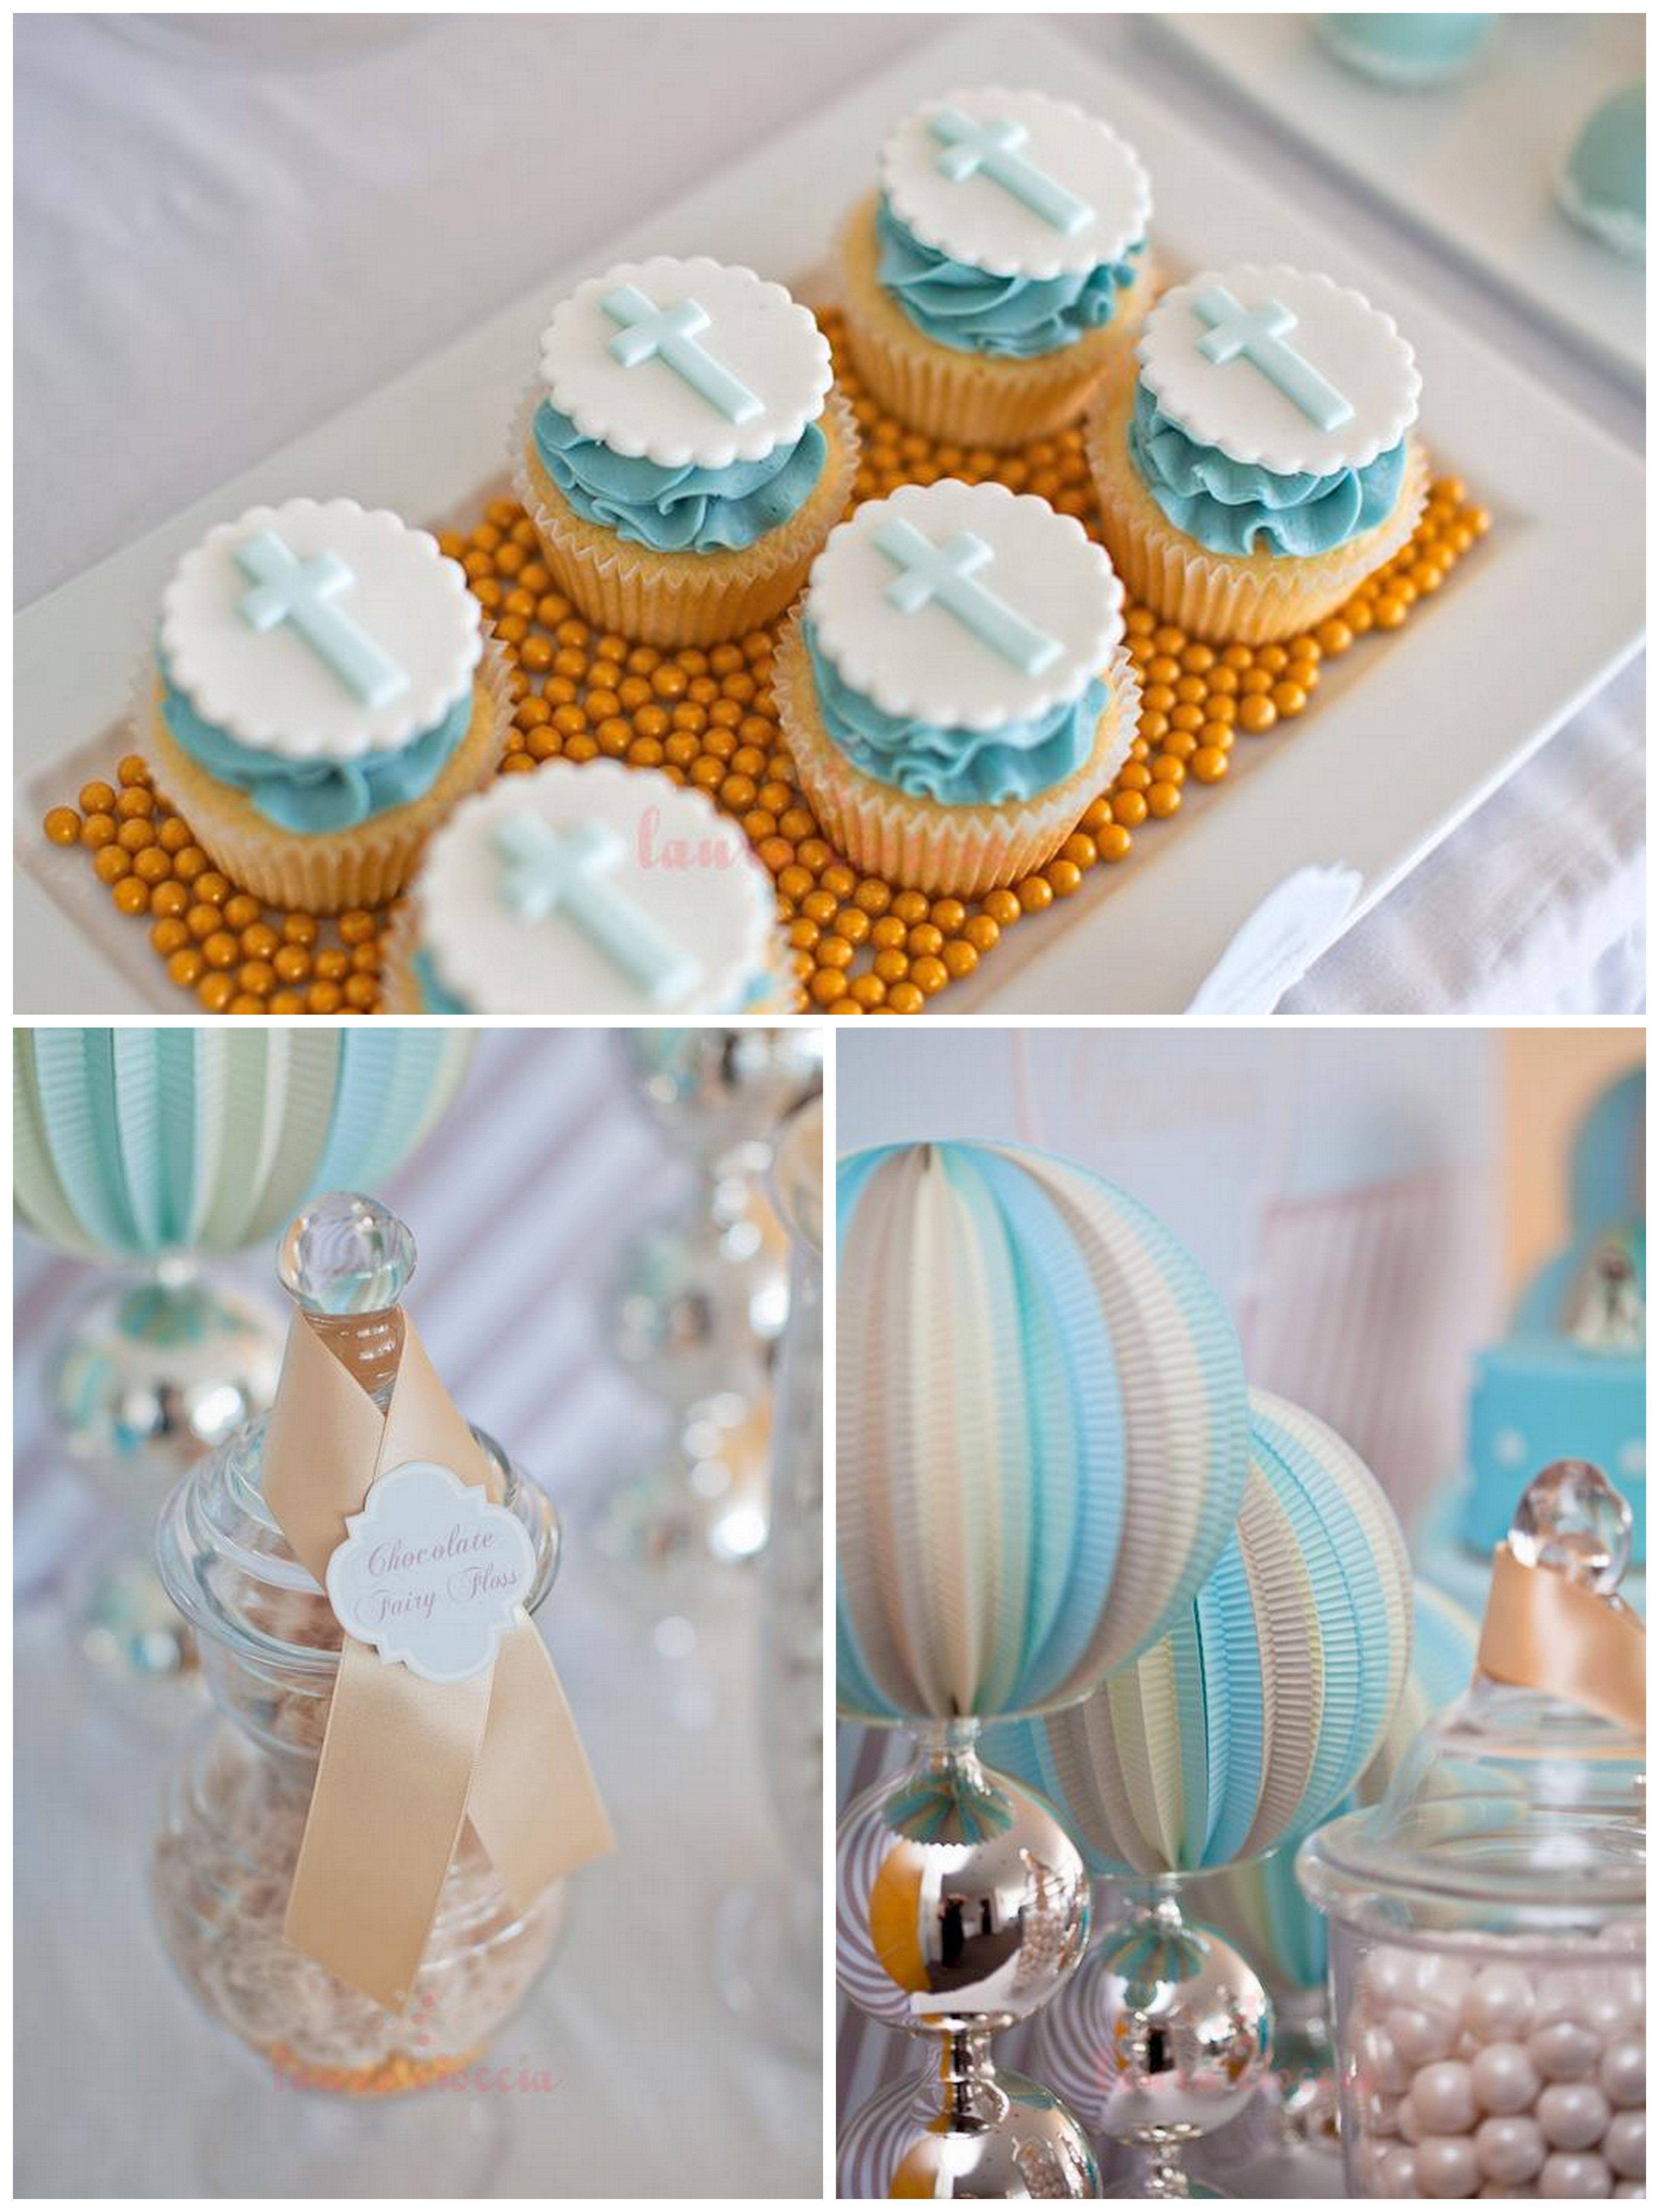 Party Baptism ideas pictures catalog photo